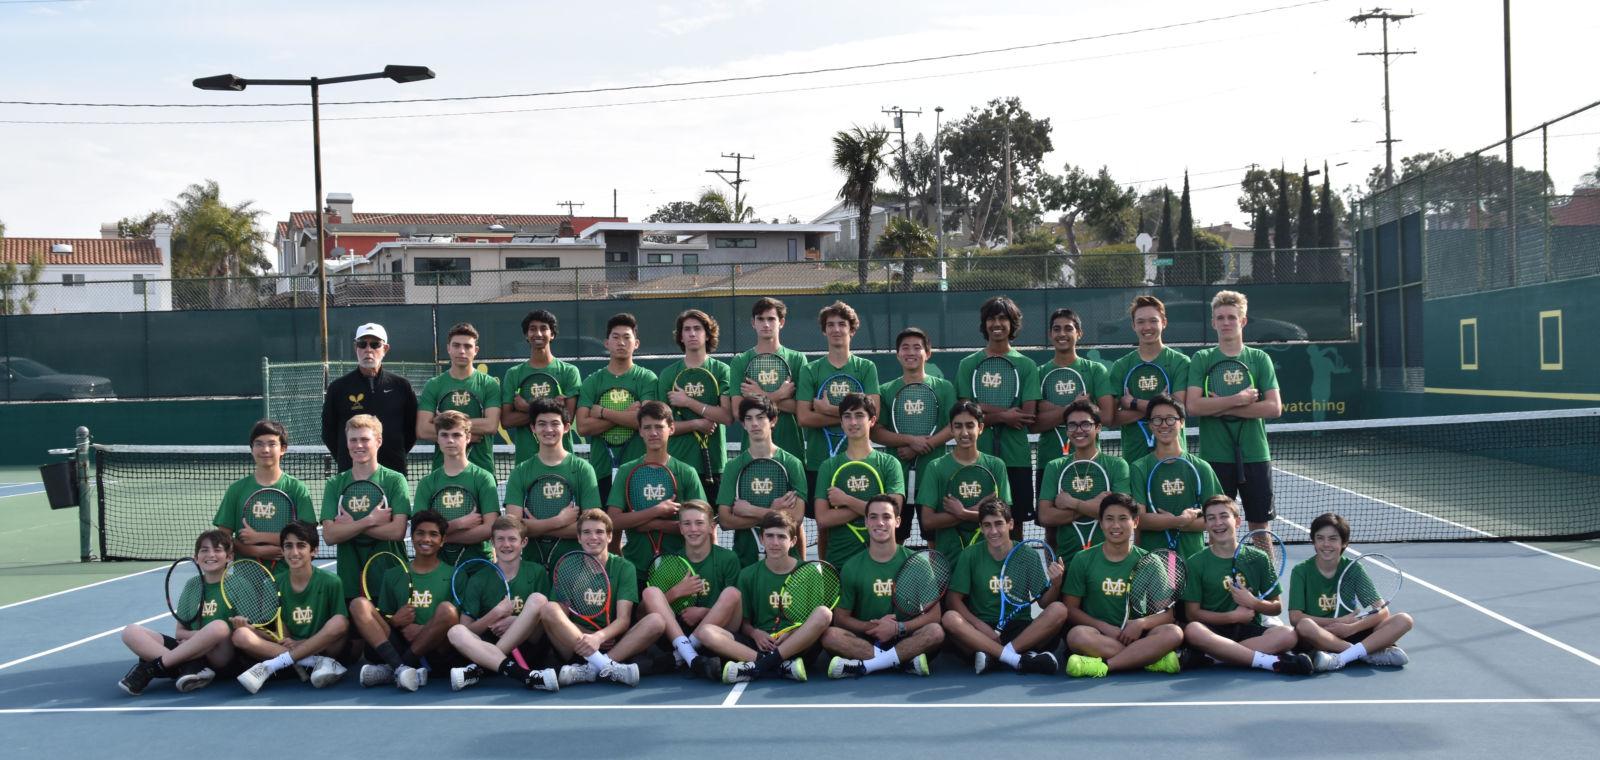 Tennis – Boys – Mbx Foundation Pertaining To Mira Costa High School Calendar 2020